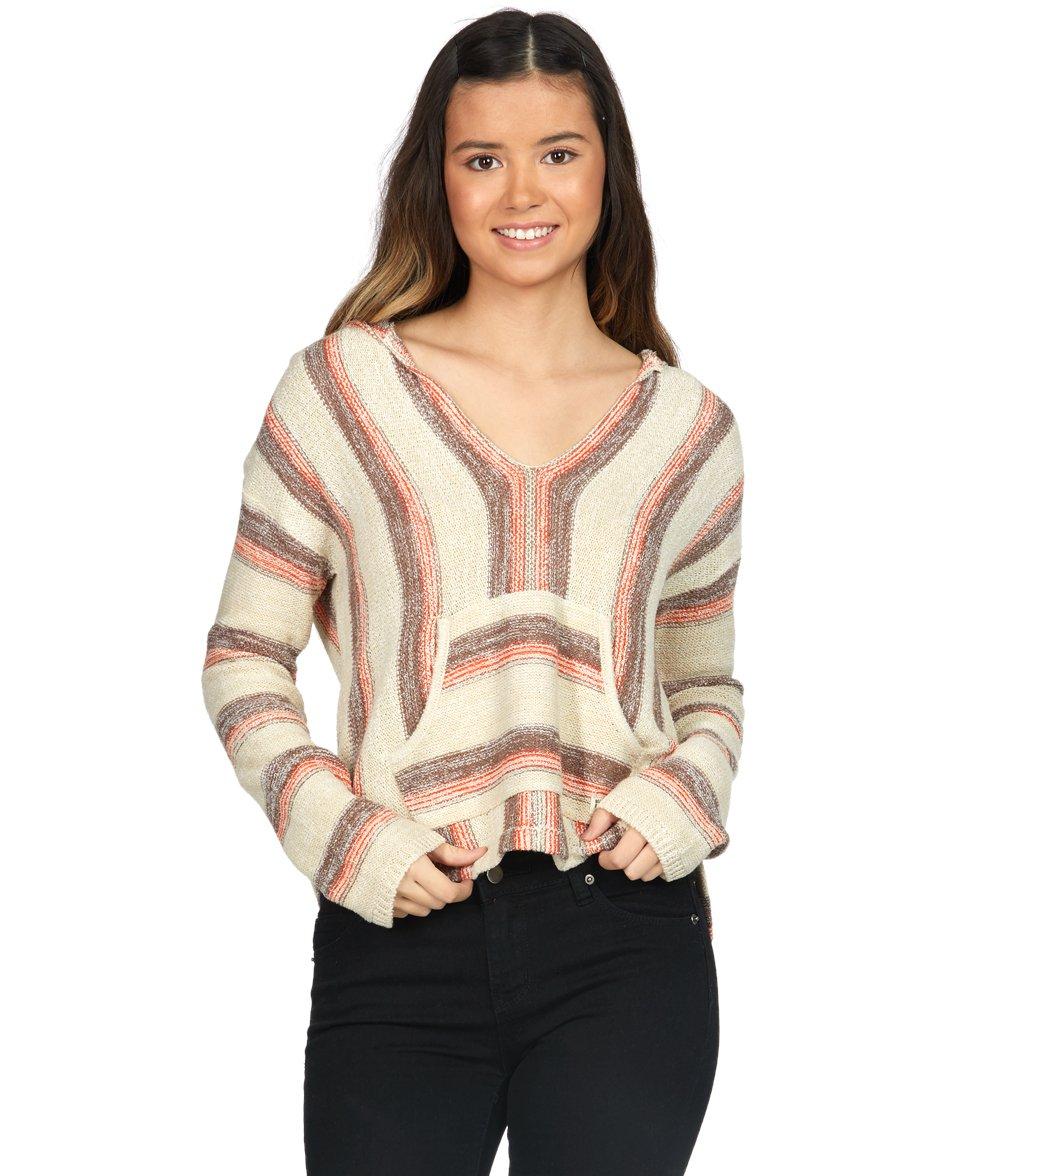 224c9741d1 Billabong Women's Baja Beach Hooded Pullover Sweater at SwimOutlet.com -  Free Shipping